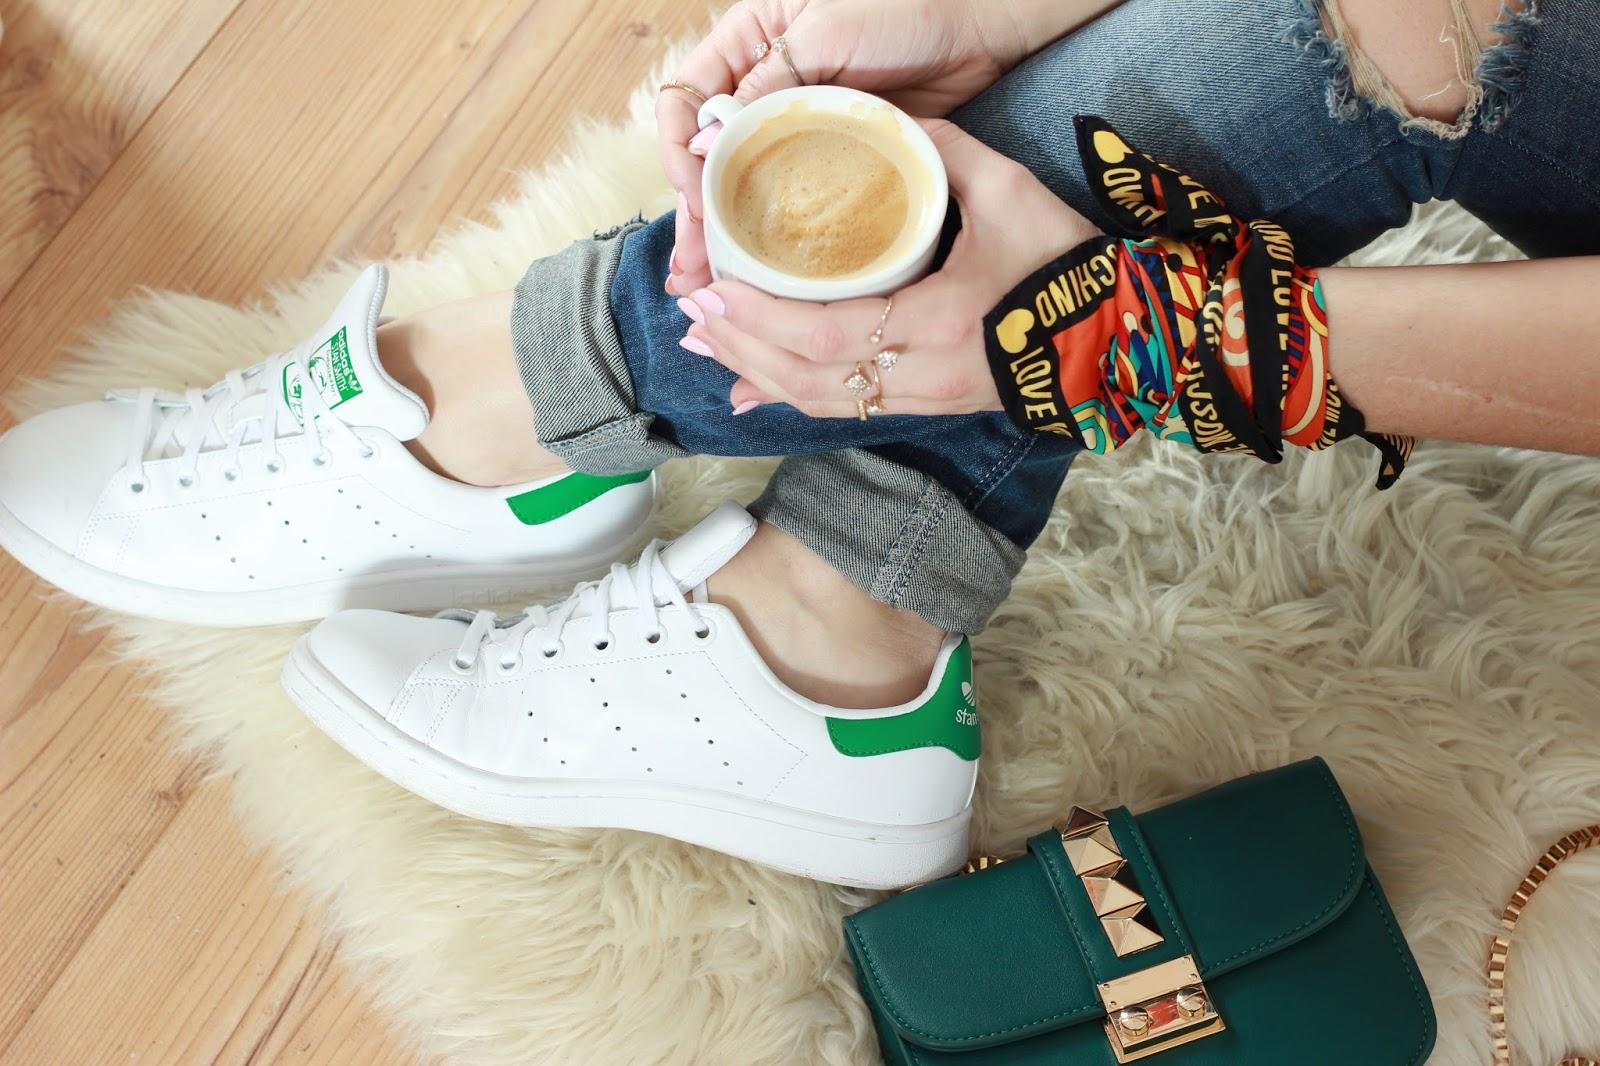 Fashionstylebyjohanna - Stan Smith- Fashionblogger in Adidas - Adidas Shuhe - Weiße sneaker - Fashionblogger - German Fashionblogger